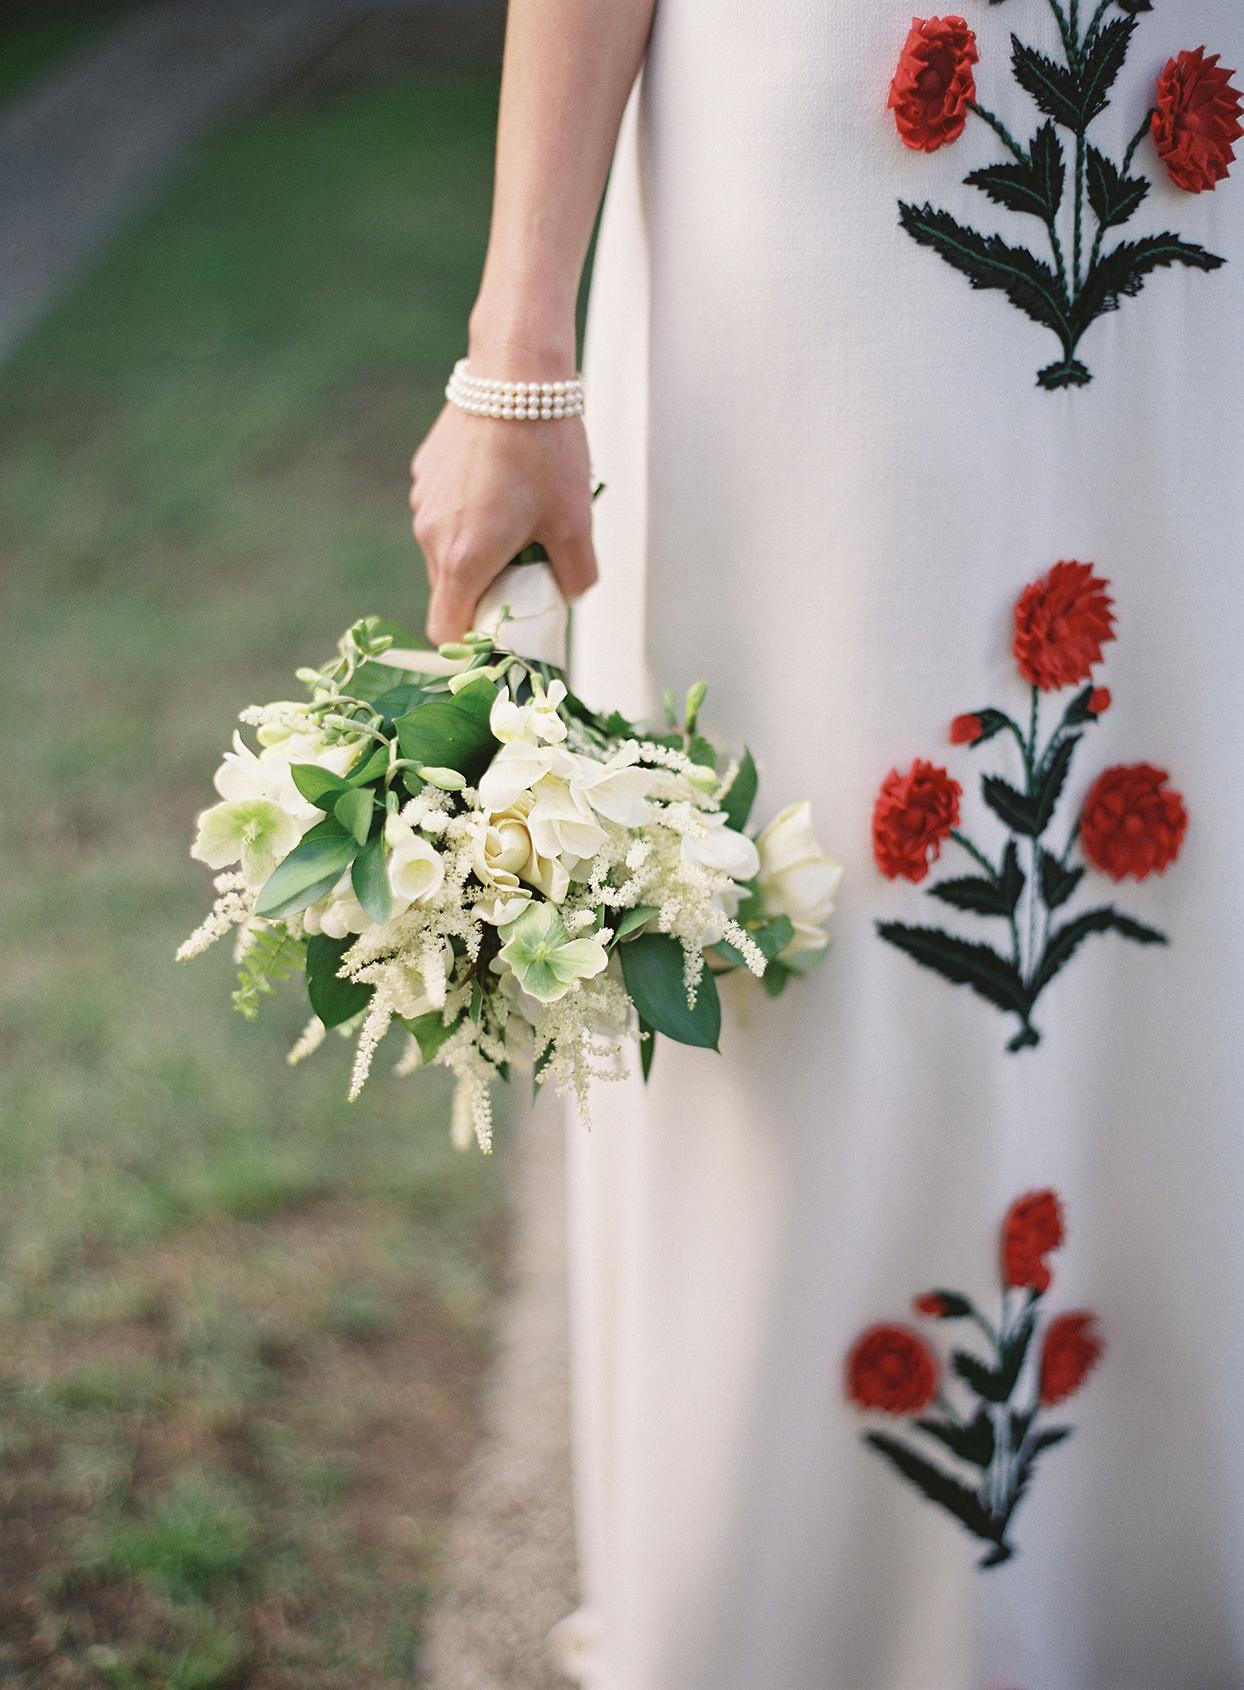 beverly steve bride's white wedding bouquet